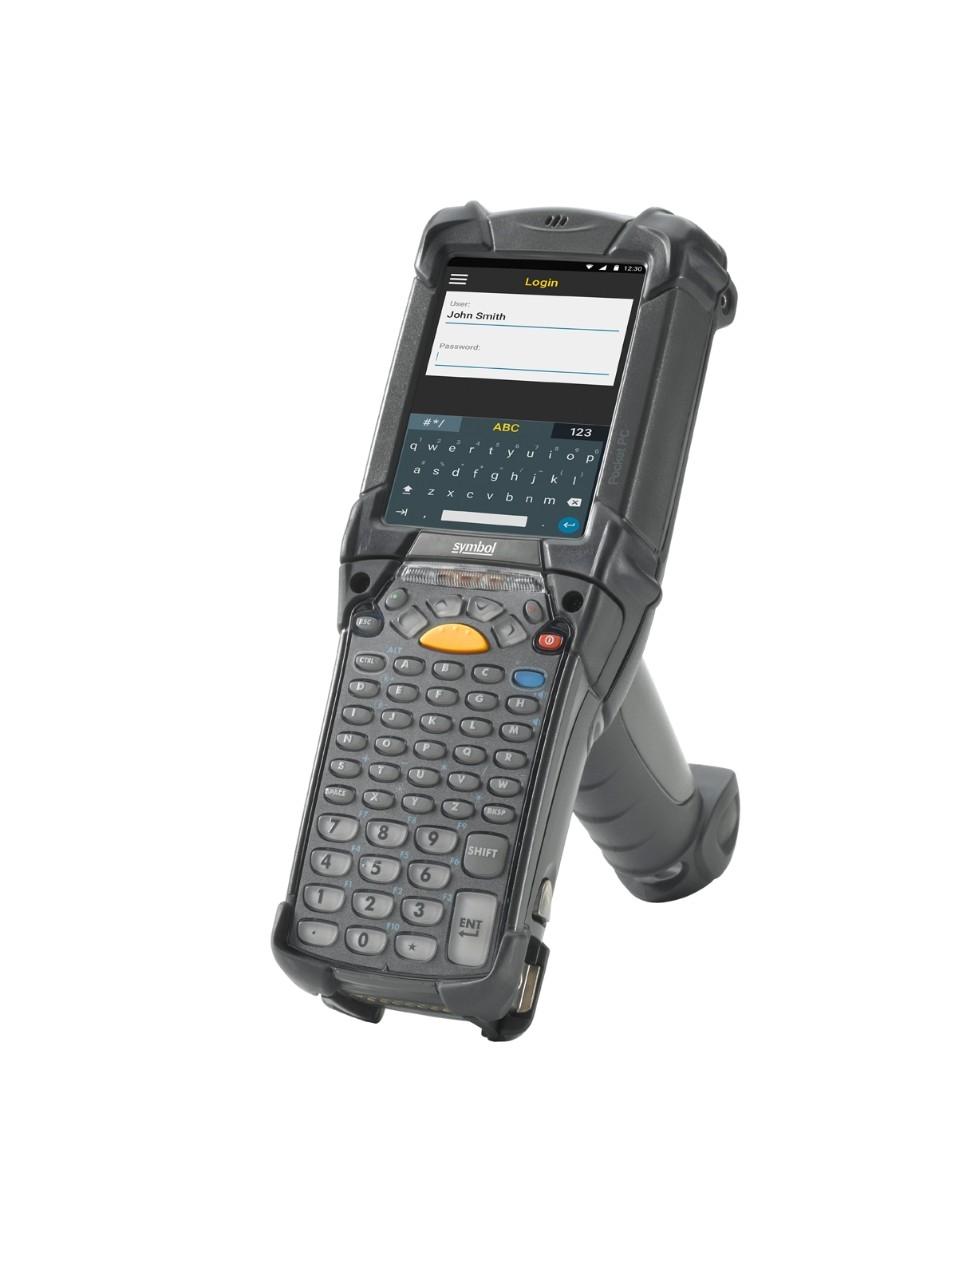 Zebra MC9200 Android Mobile Computer, Left View